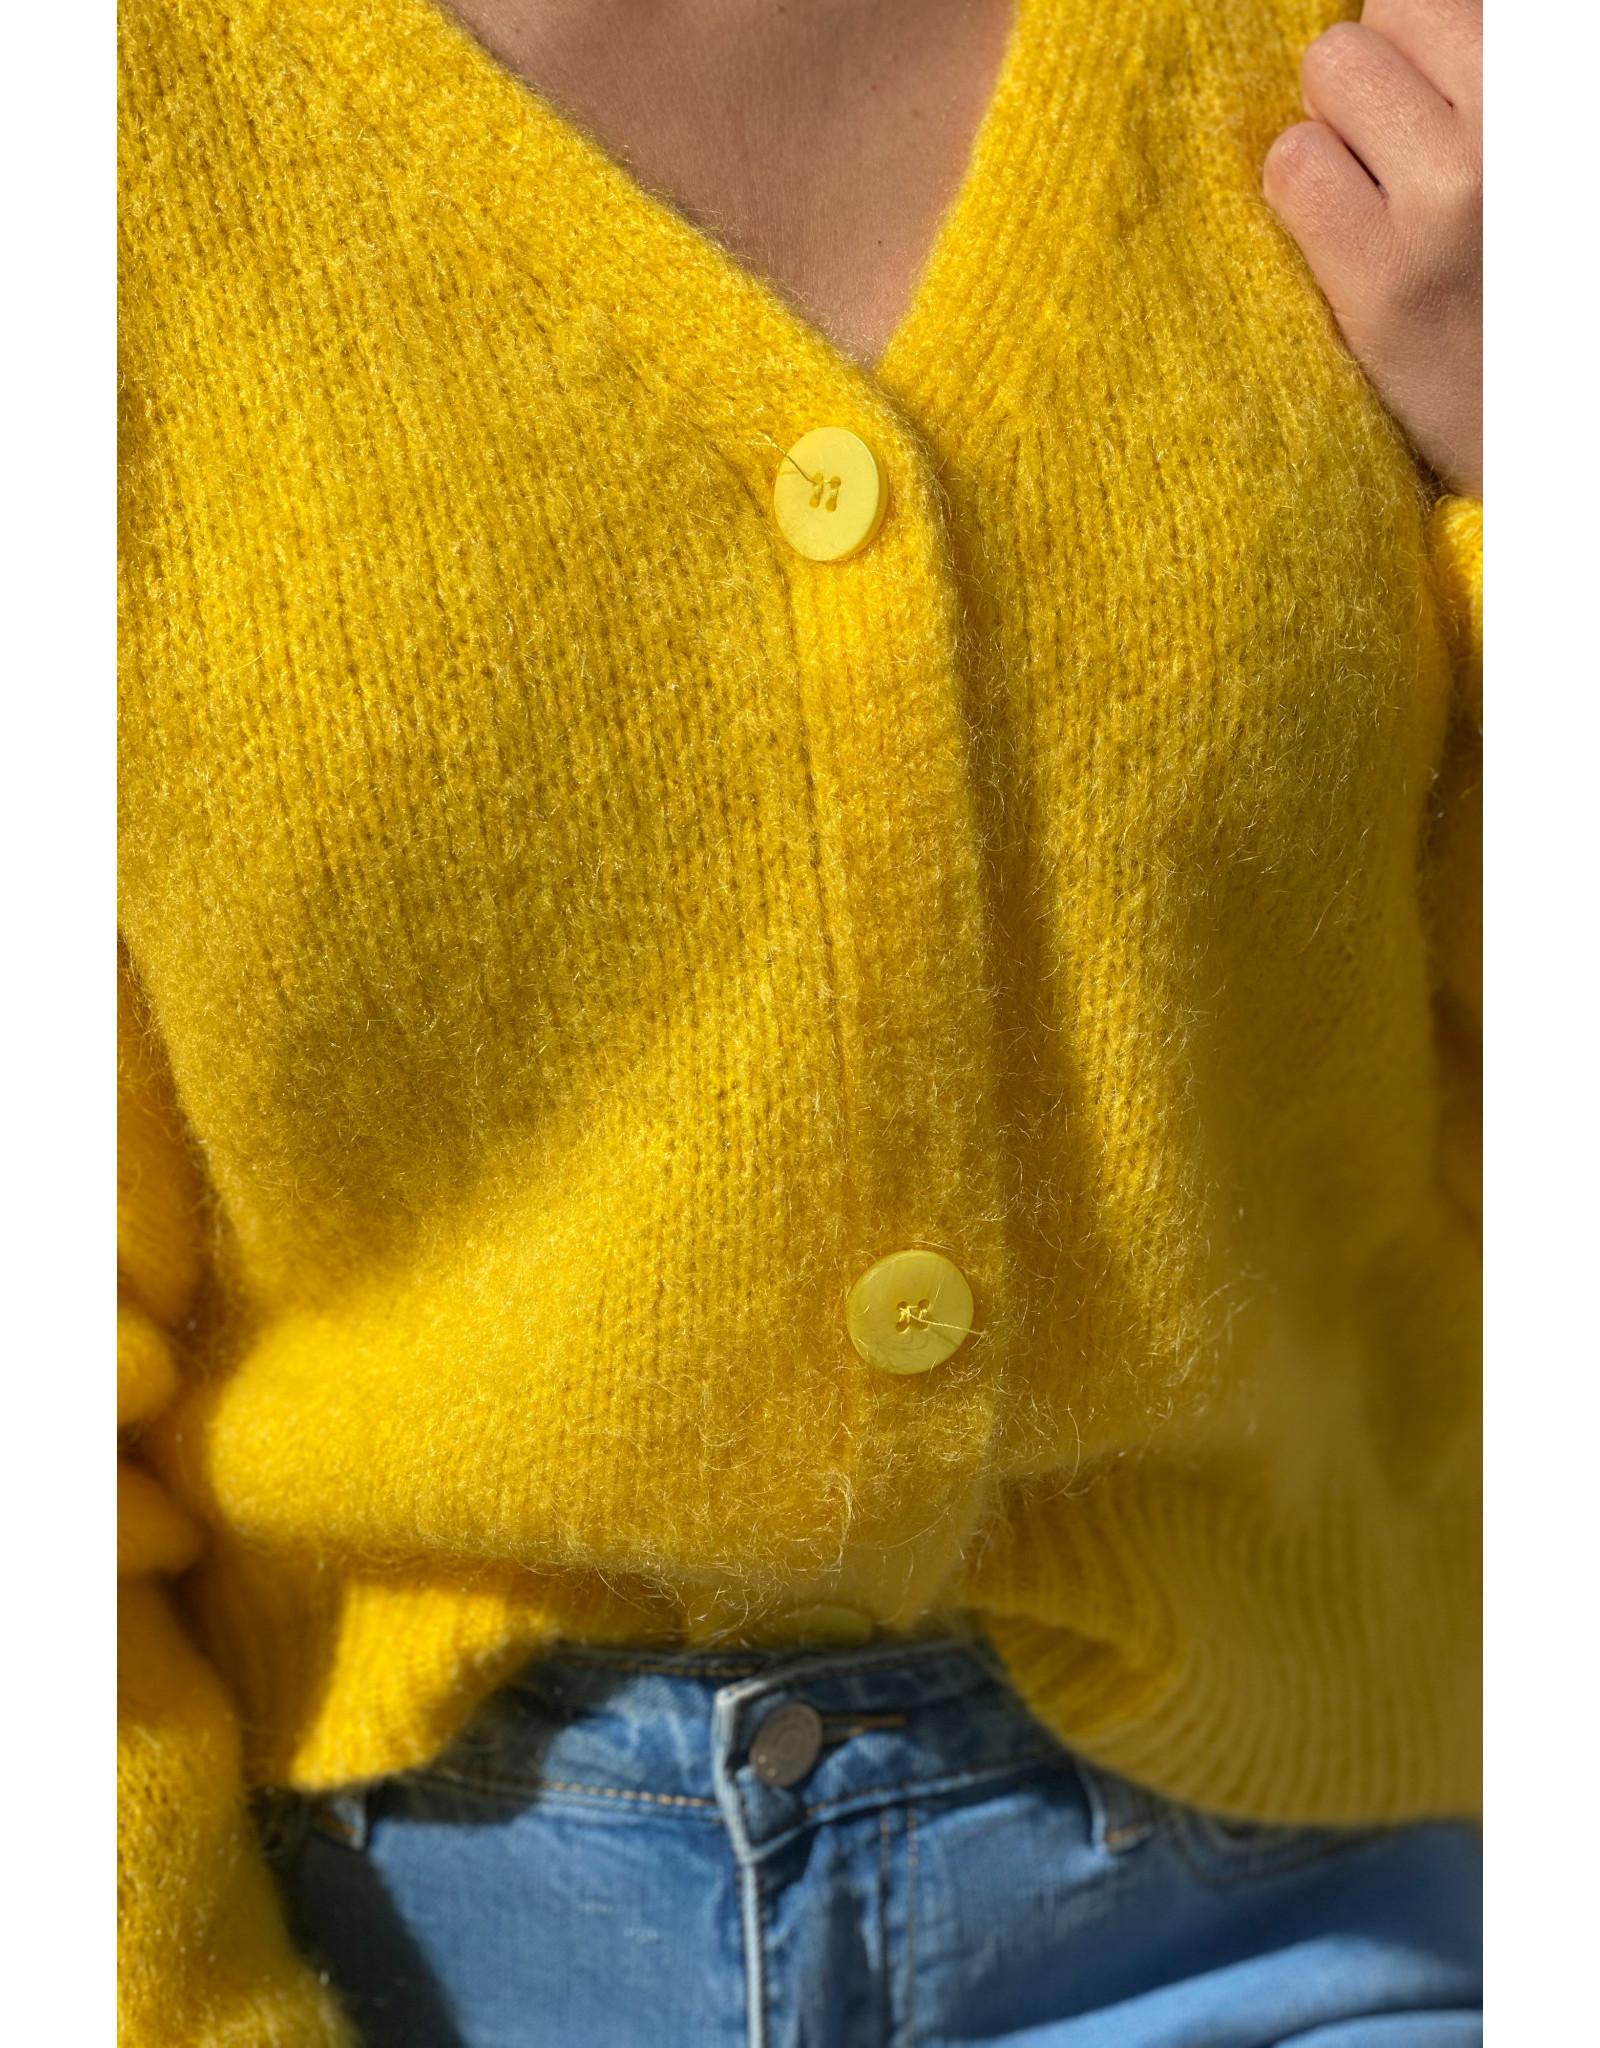 she's milano She's Milano x button cardigan yellow sun